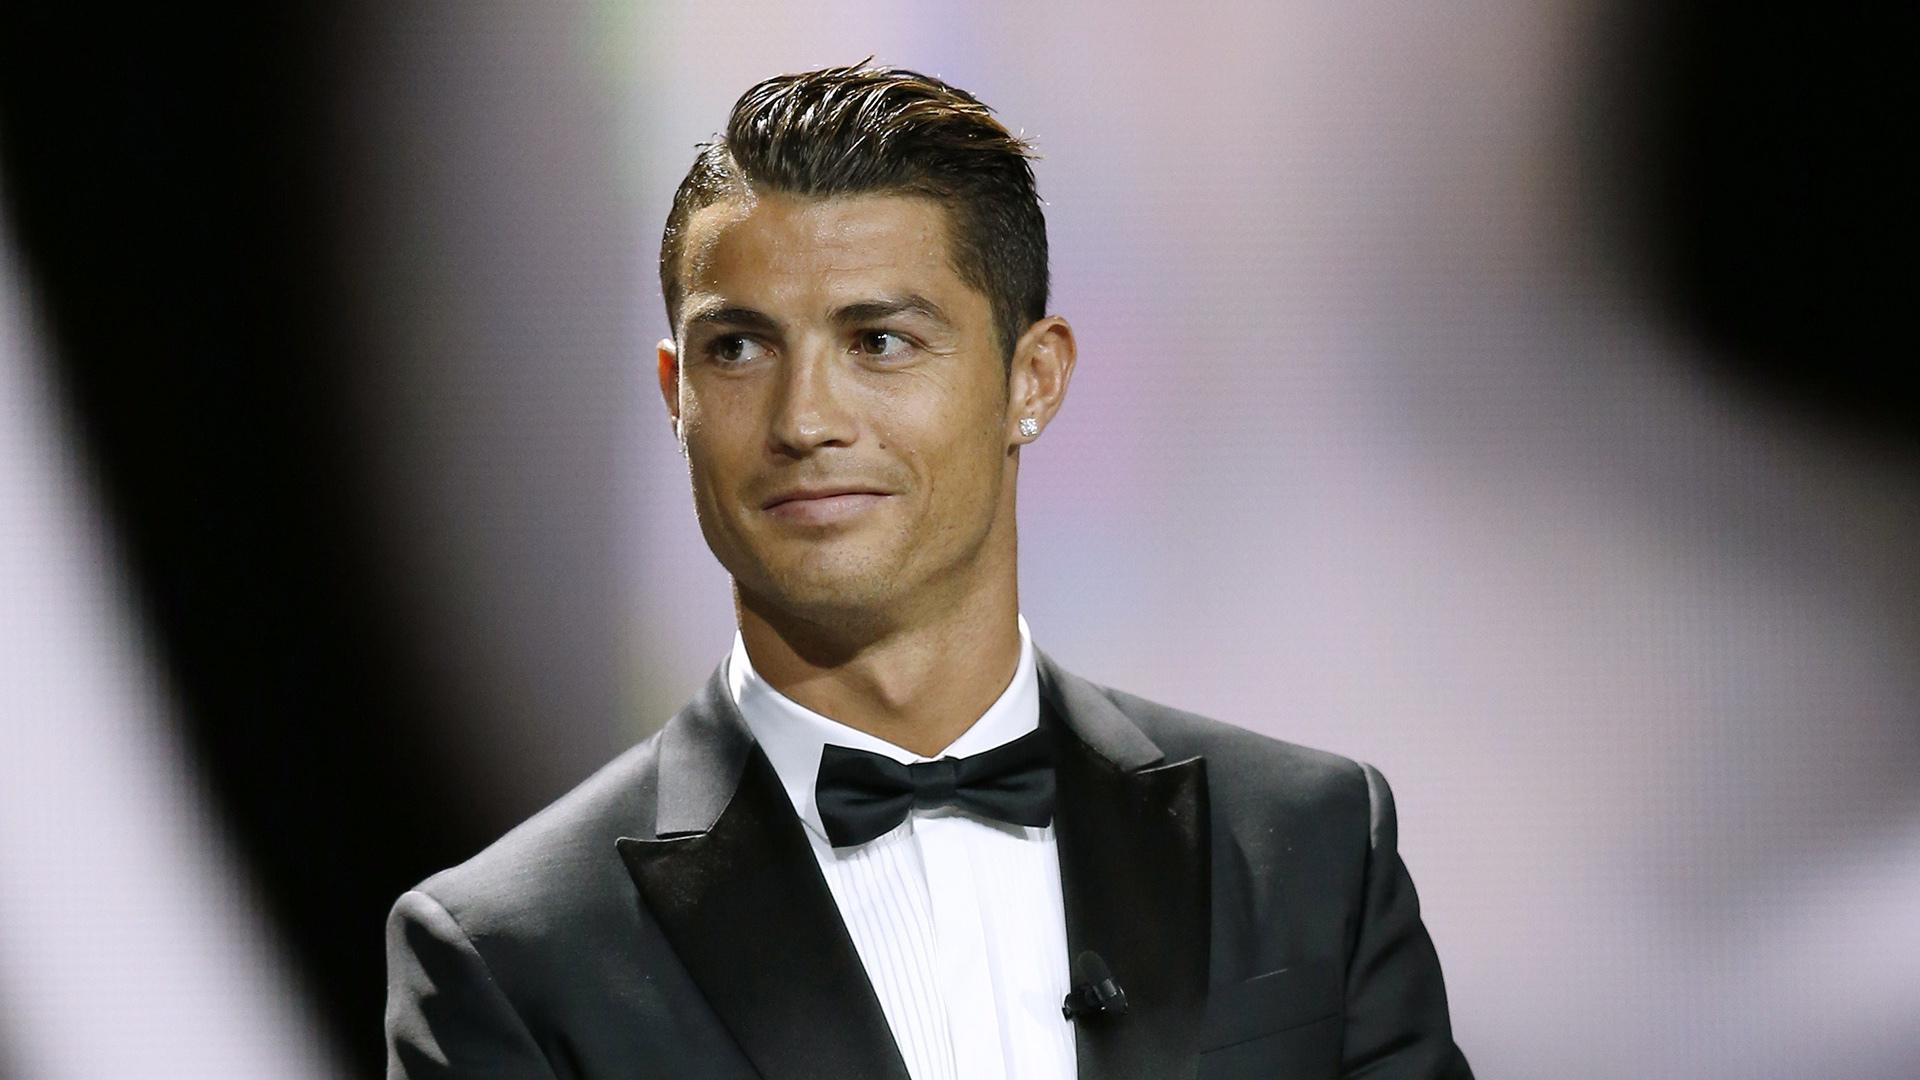 Cristiano Ronaldo Net Worth, Family and Lifestyle - Sports Leo